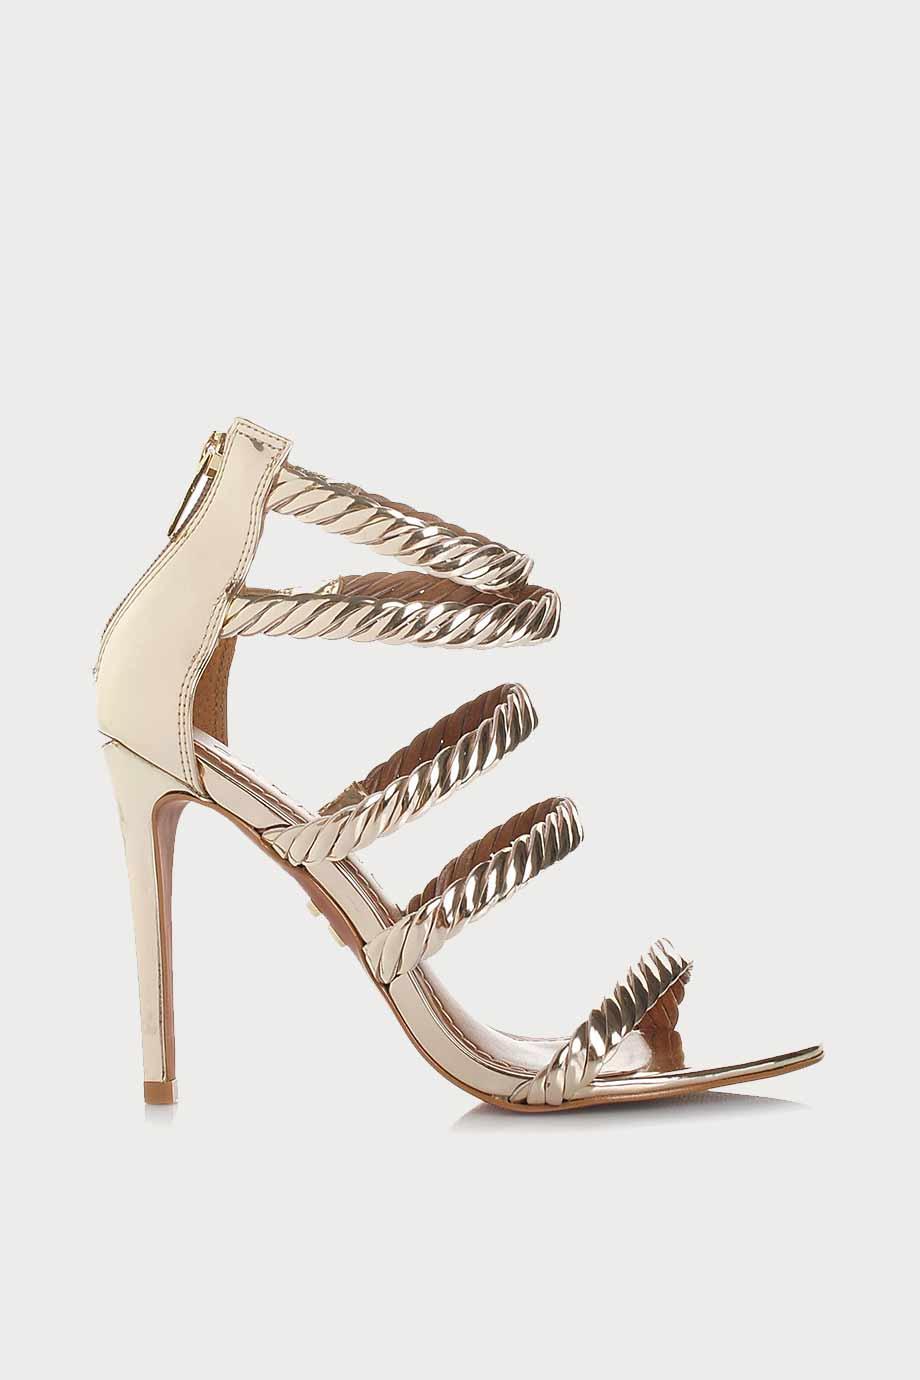 spiridoula metheniti shoes xalkida p Carrano 143005 CAB1 Specchi 1